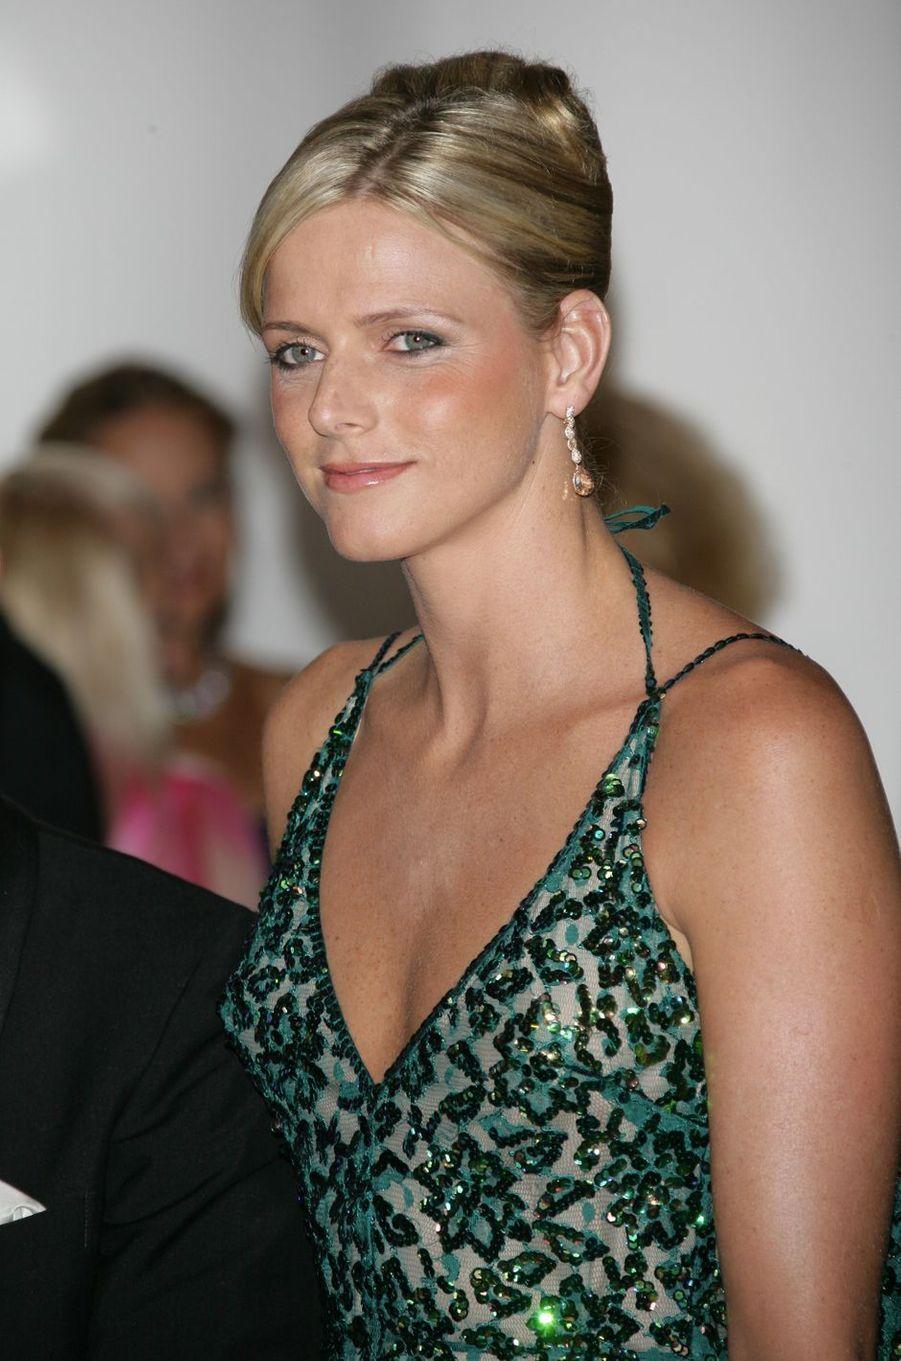 Charlène Wittstock à Monaco, le 4 août 2006